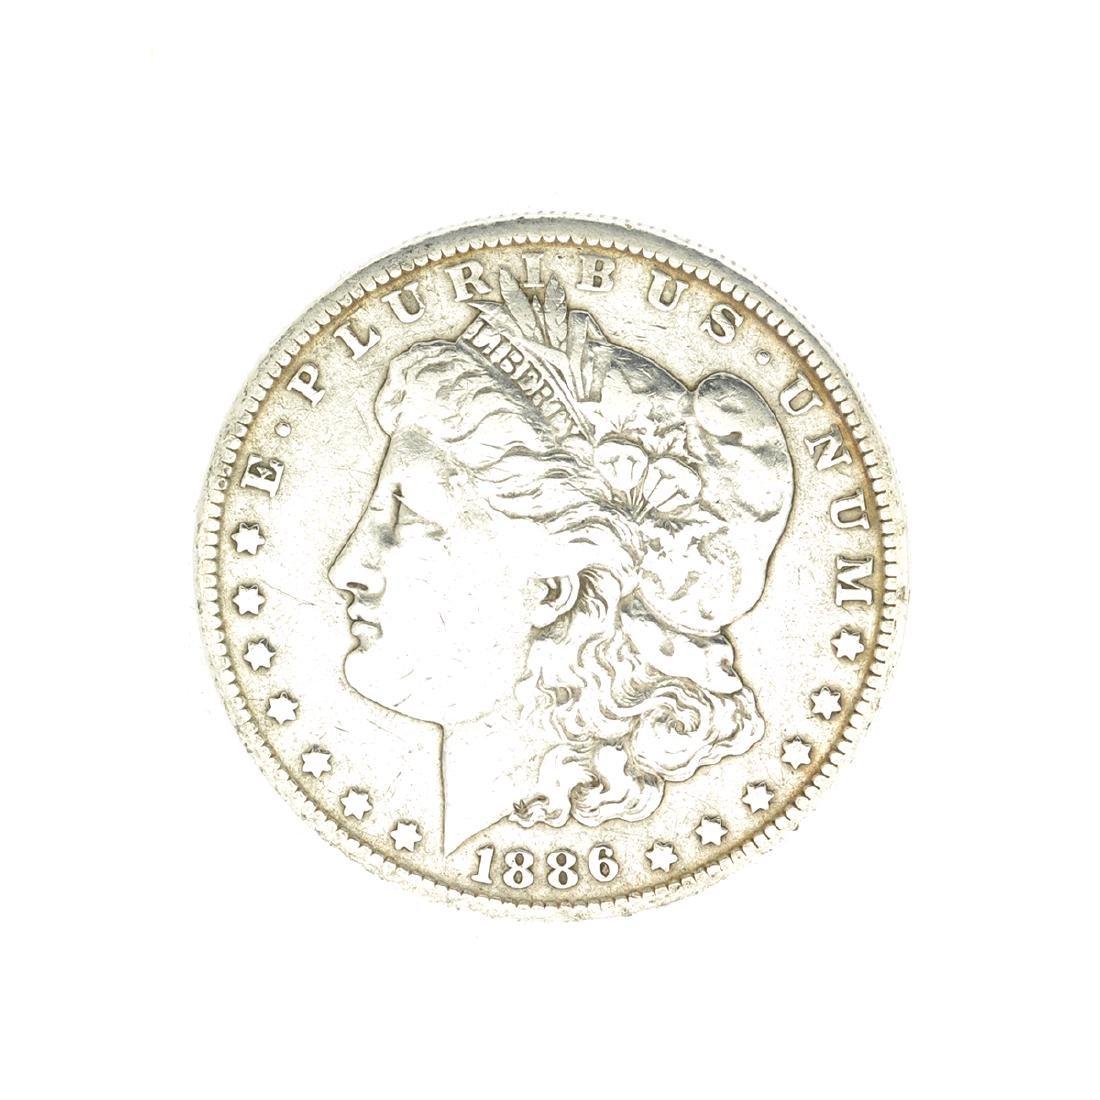 Rare 1886-O U.S. Morgan Silver Dollar